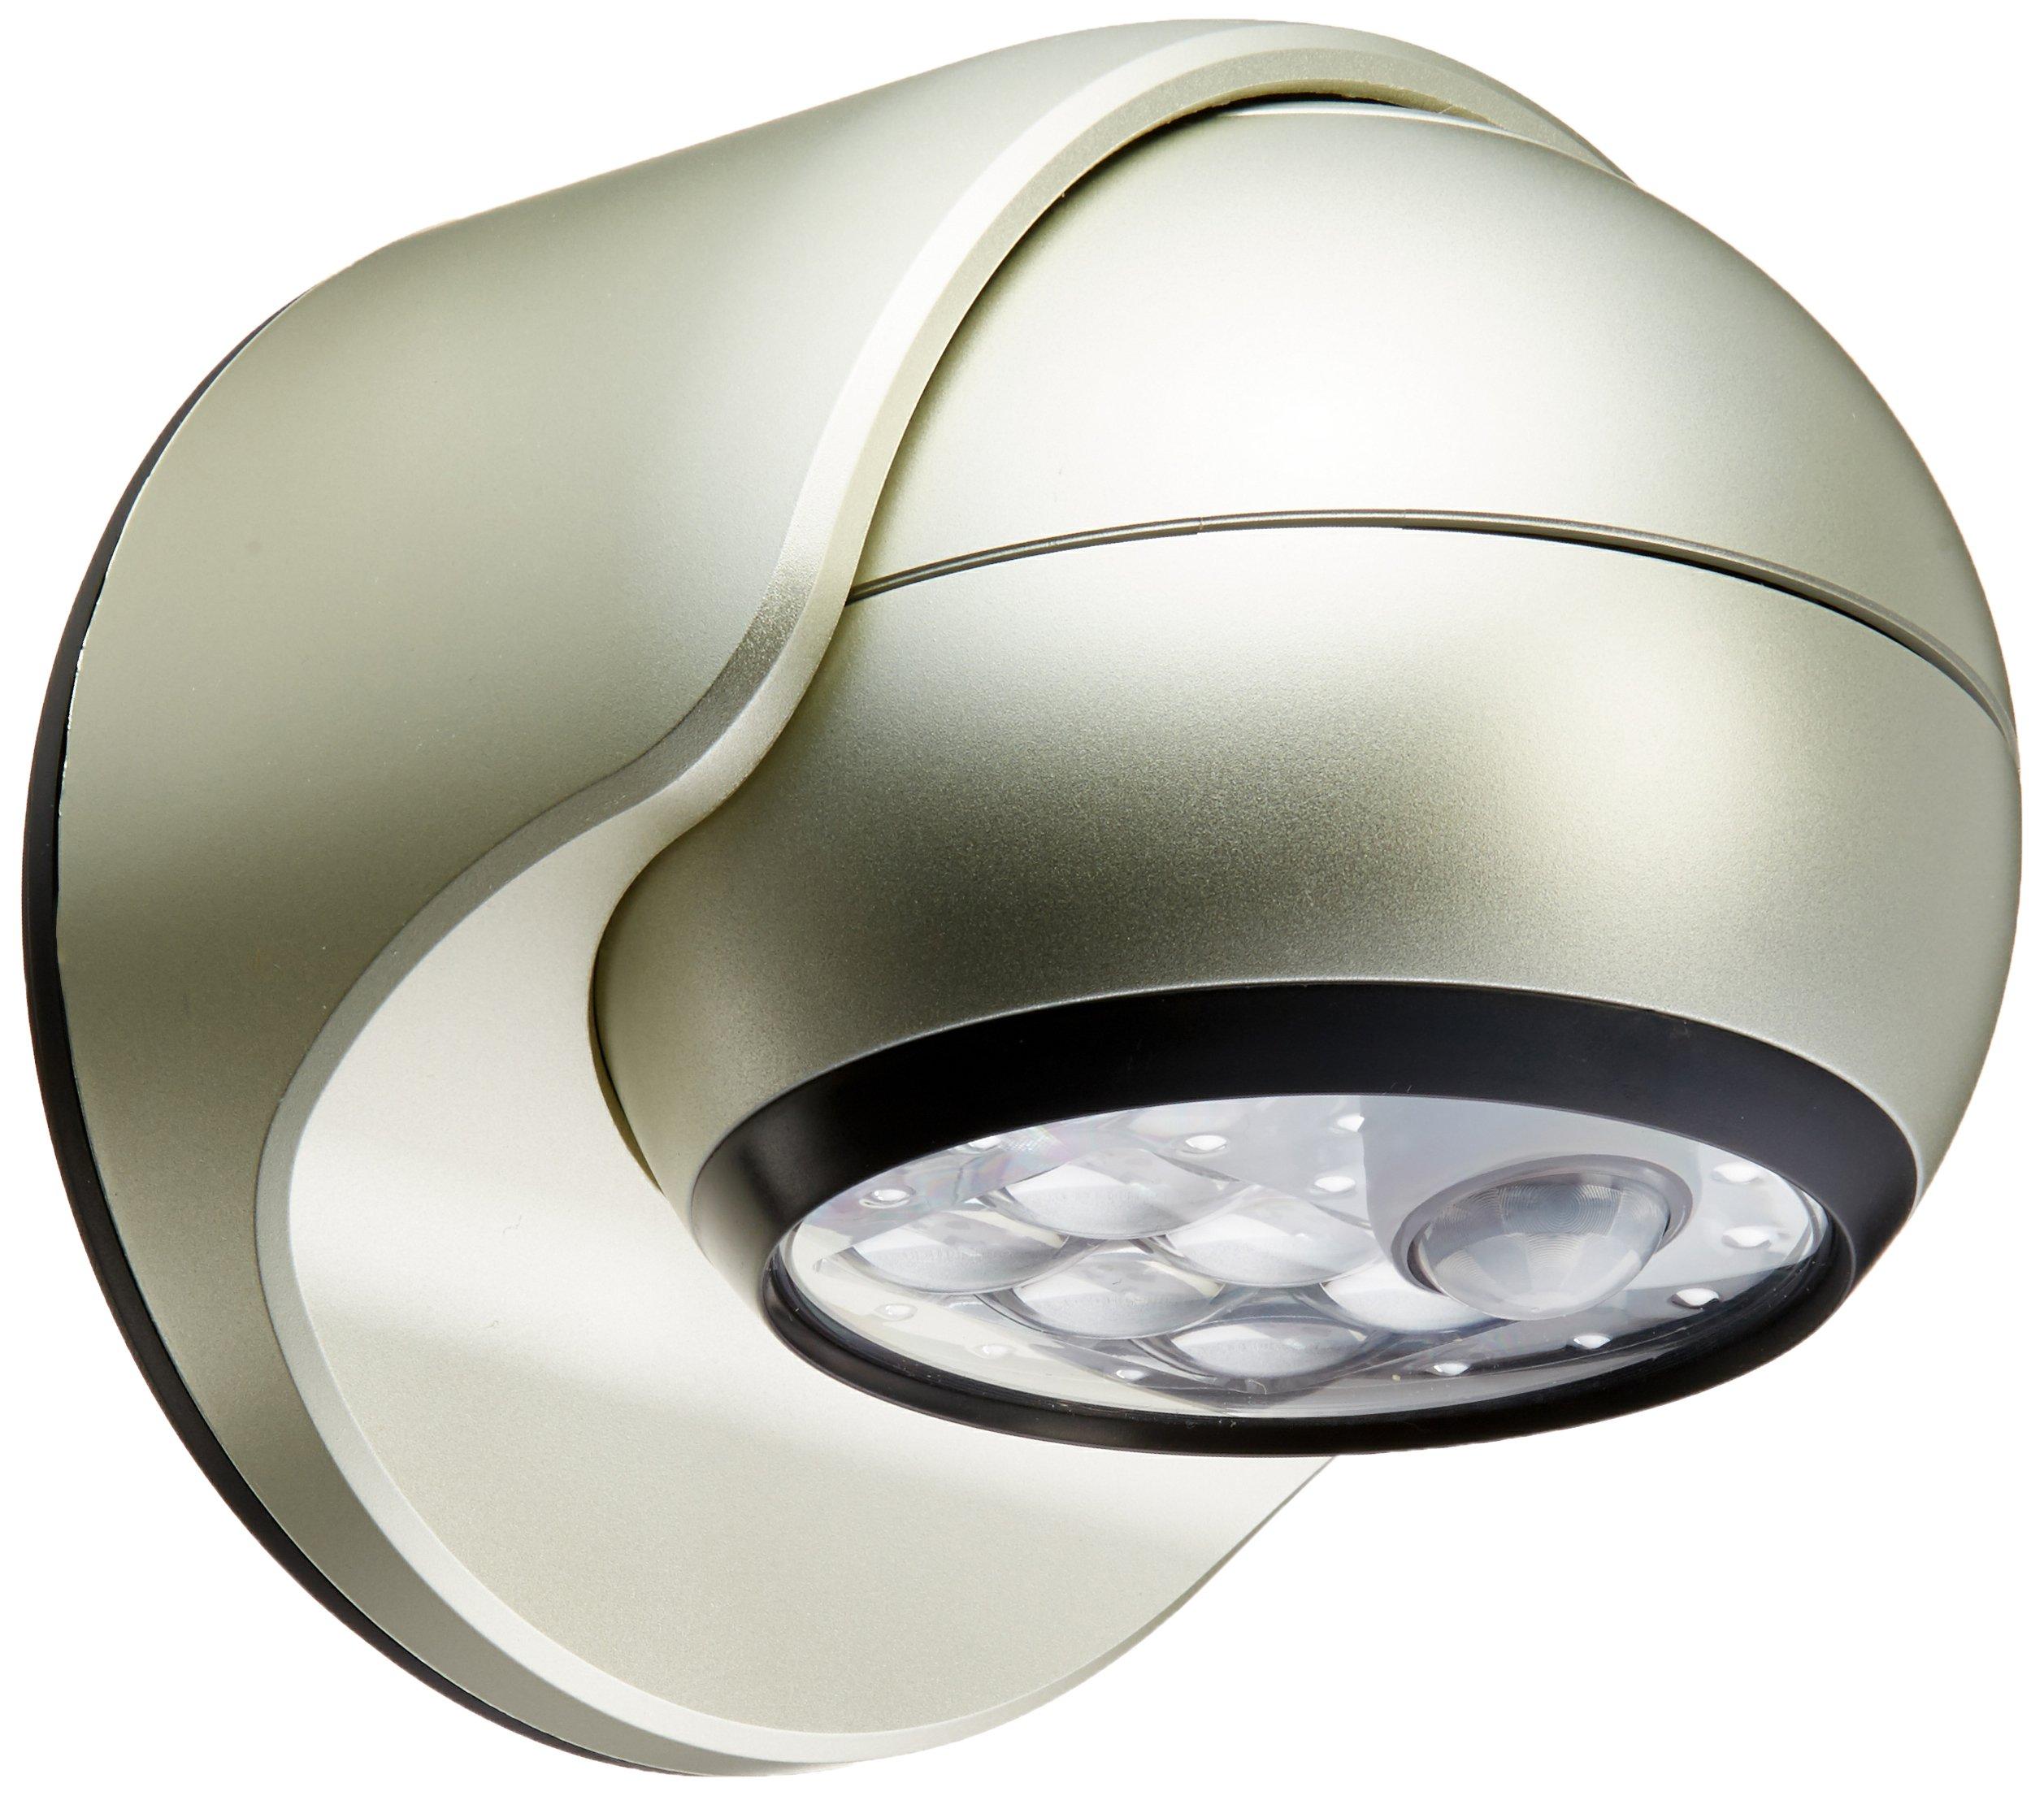 LIGHT IT! by Fulcrum 20031-101 6-LED Wireless Motion Sensor Weatherproof Porch Light, Silver